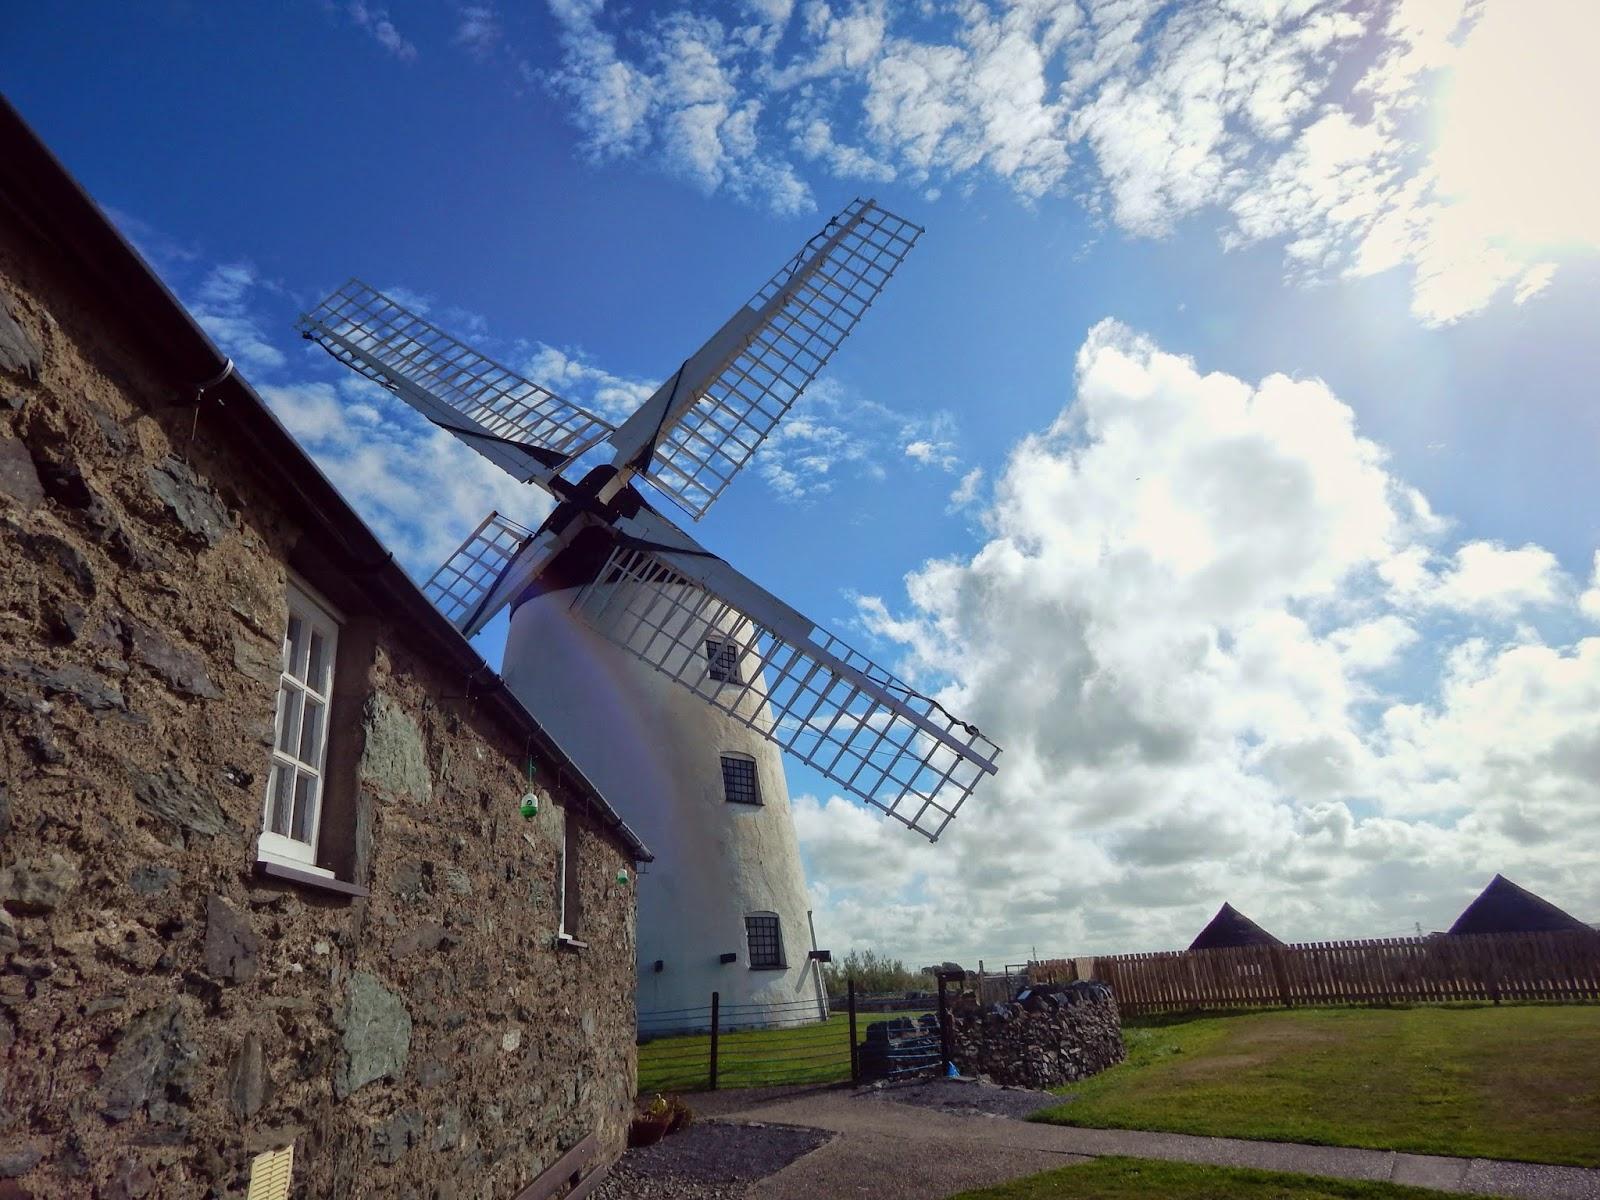 Llanddeusant windmill